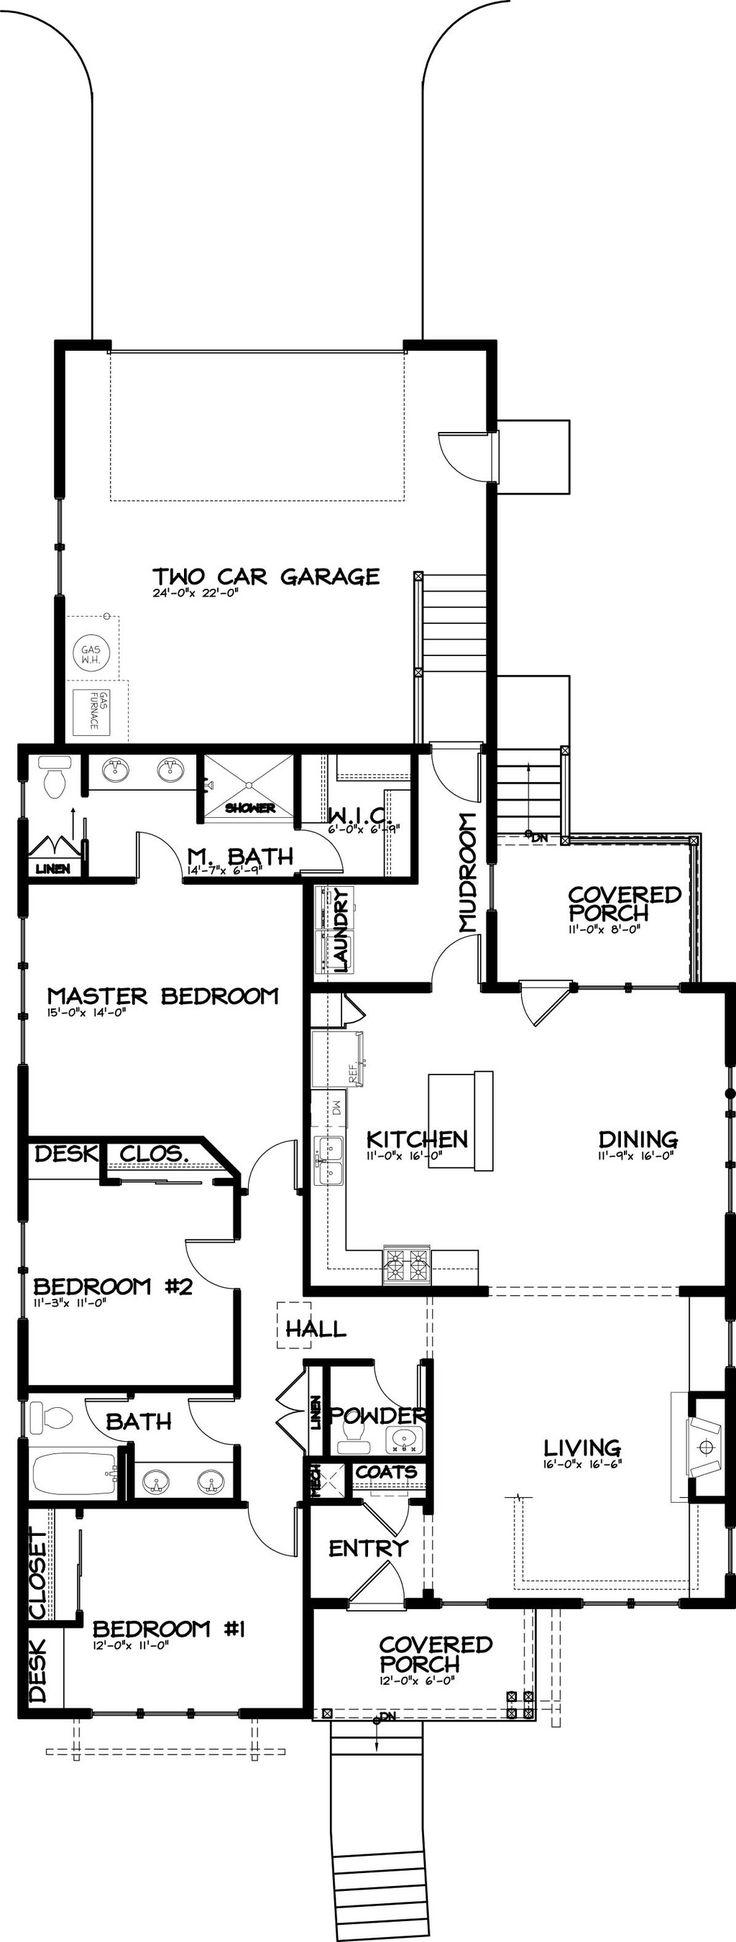 497 best dream house plans images on pinterest dream house plans 497 best dream house plans images on pinterest dream house plans house floor plans and architecture